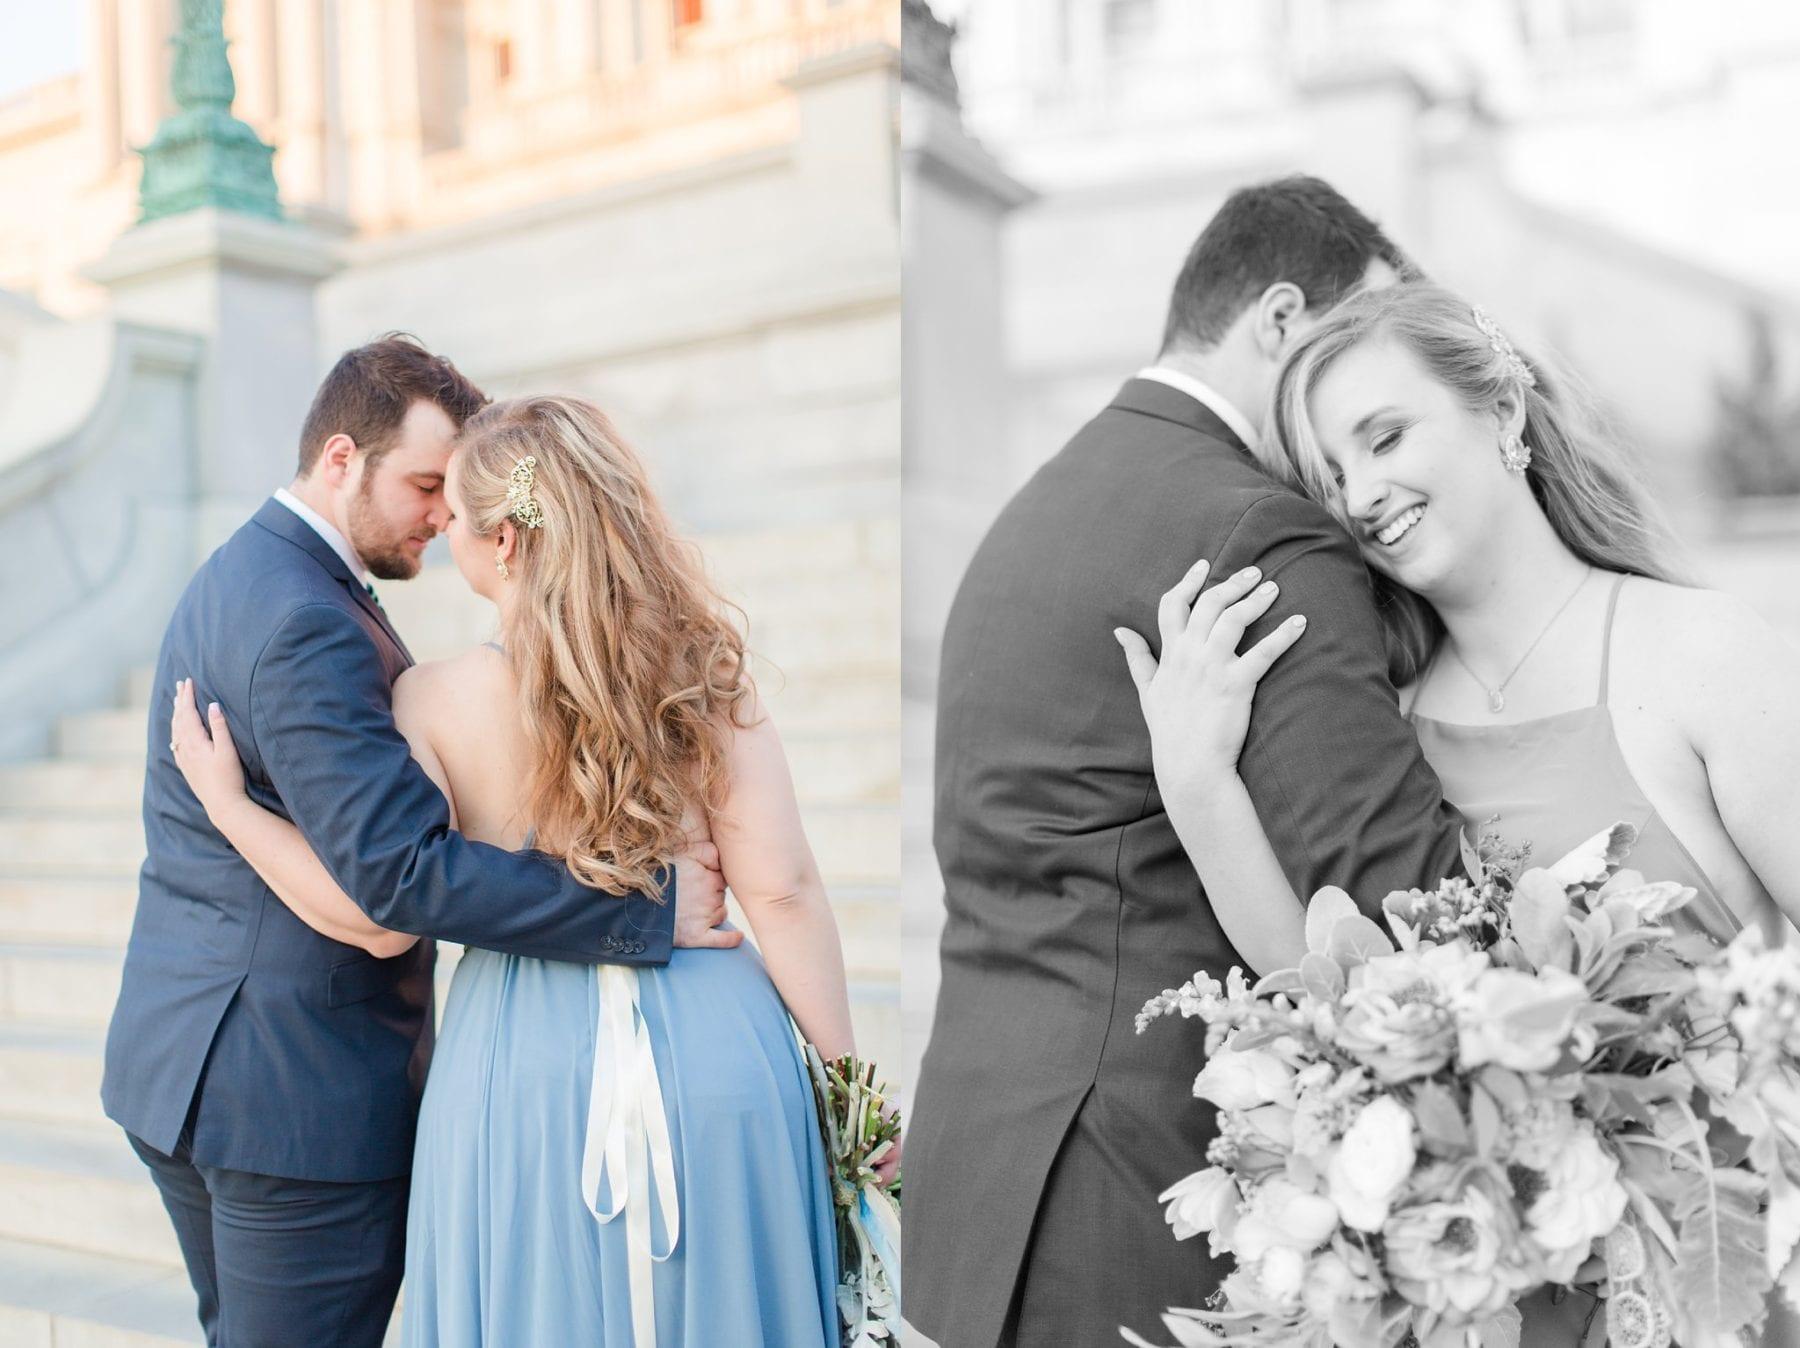 Capitol Hill Engagement Photos Kelly & Zach Washington DC Wedding Photographer Megan Kelsey Photography-283.jpg